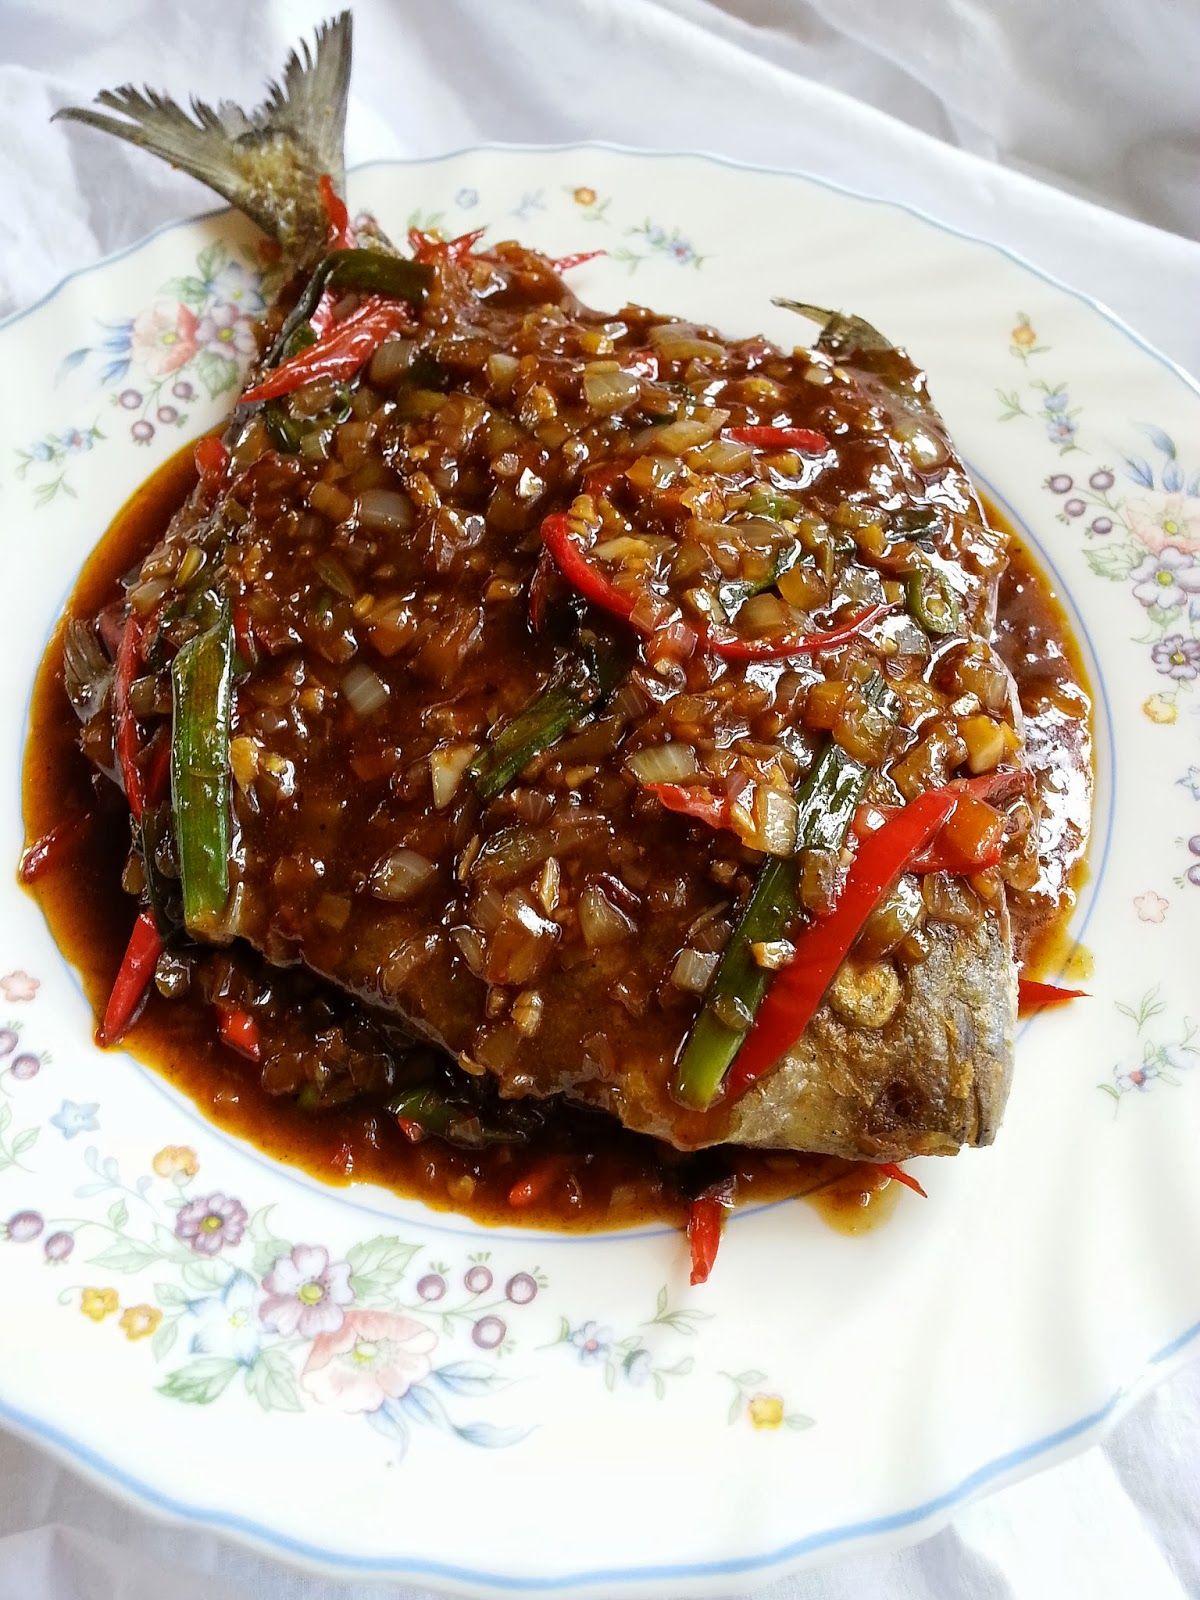 Bawal Masak Hitam Resep Ikan Ide Makanan Makanan Dan Minuman